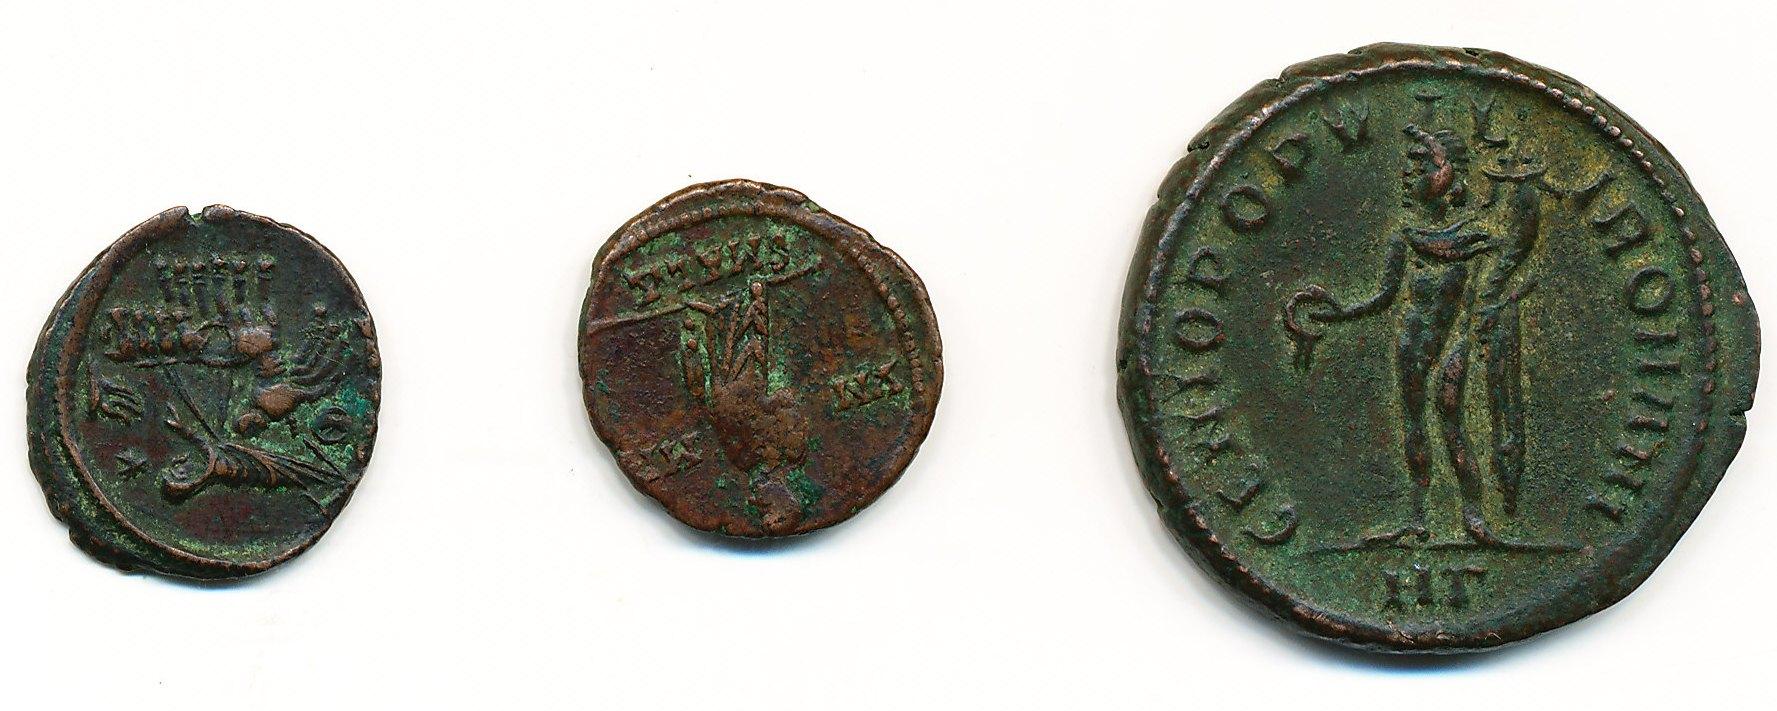 ID, genuine/fake and value (Greek/Roman coins) – Numista